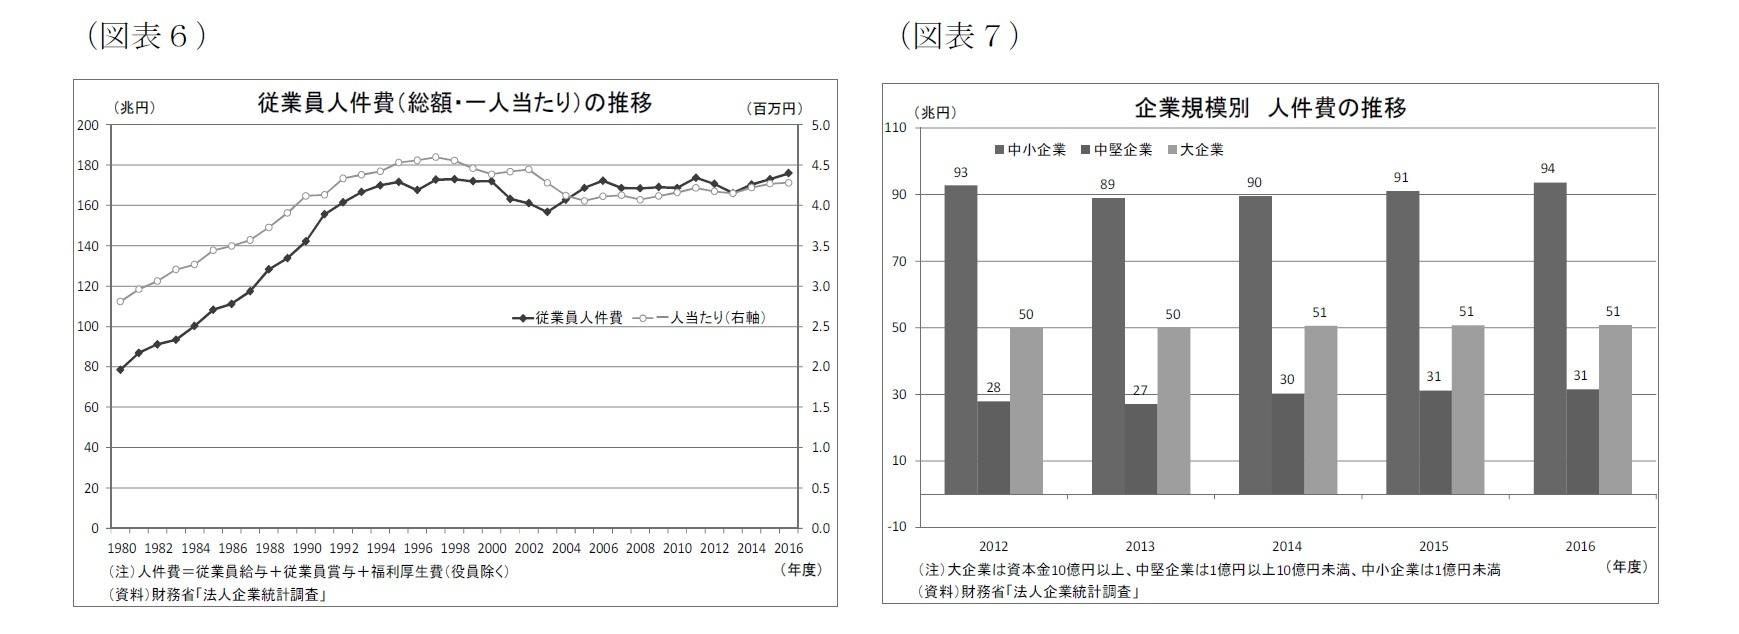 (図表6)従業員人件費(総額・一人当たり)の推移/(図表7)企業規模別人件費の推移